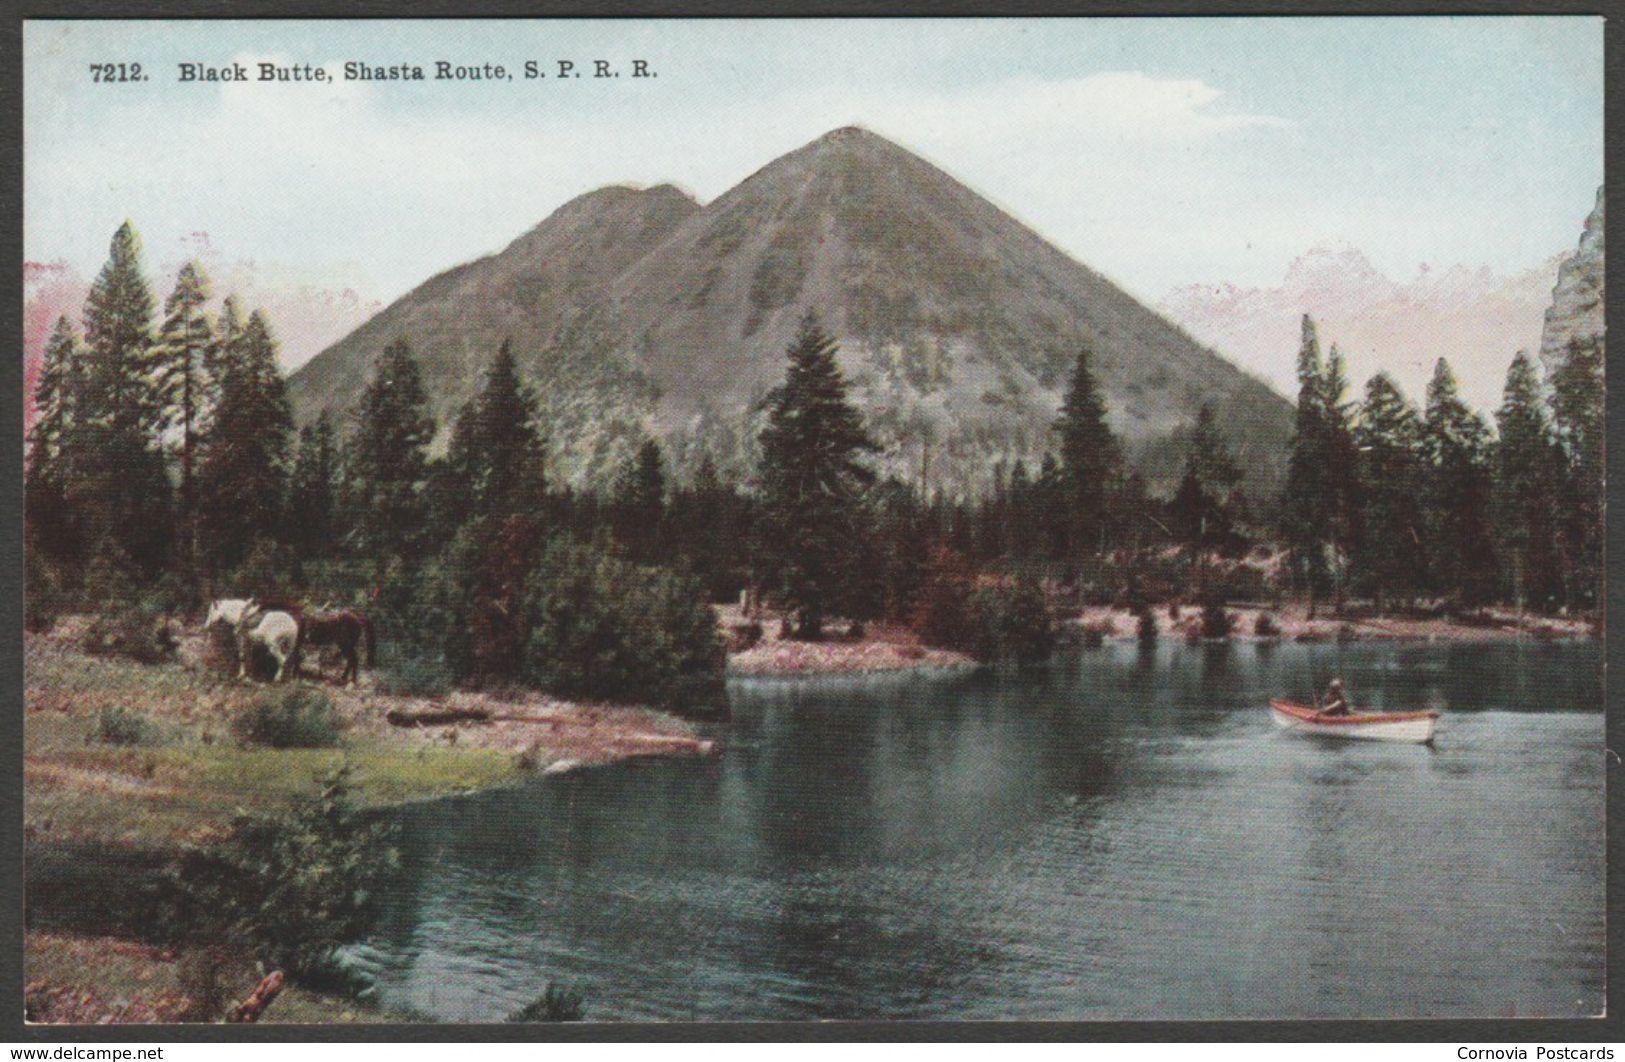 Black butte shasta route sprr california c1910 bn co